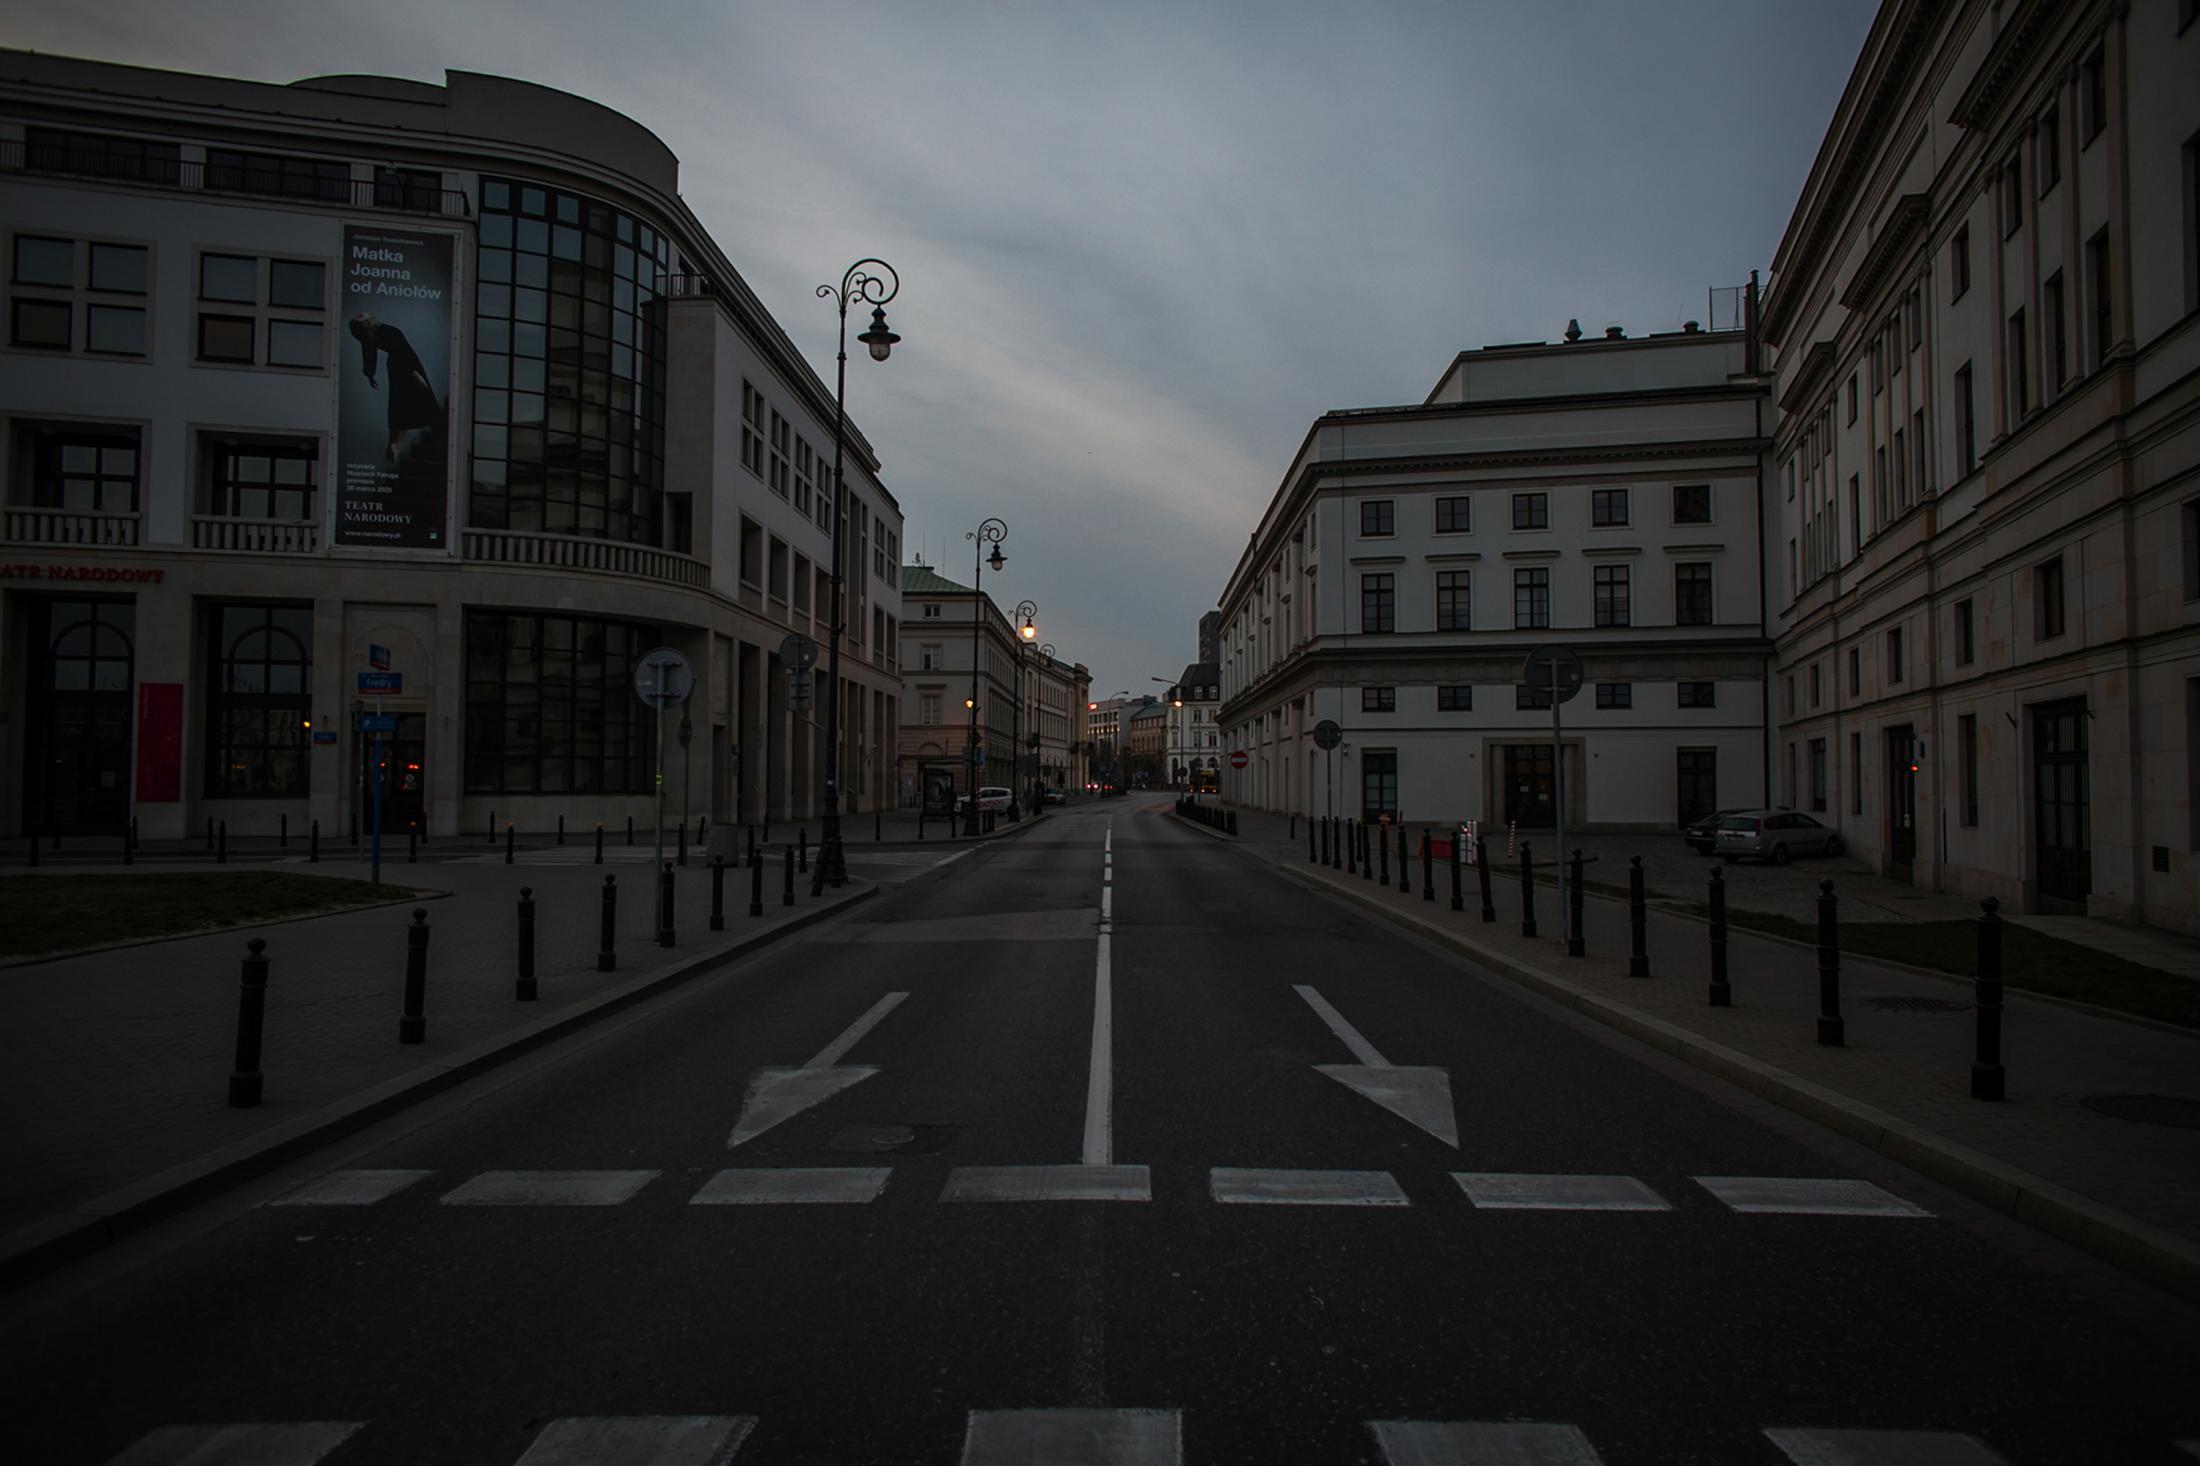 Poland's nationwide quarantine. 03/2020 Warsaw